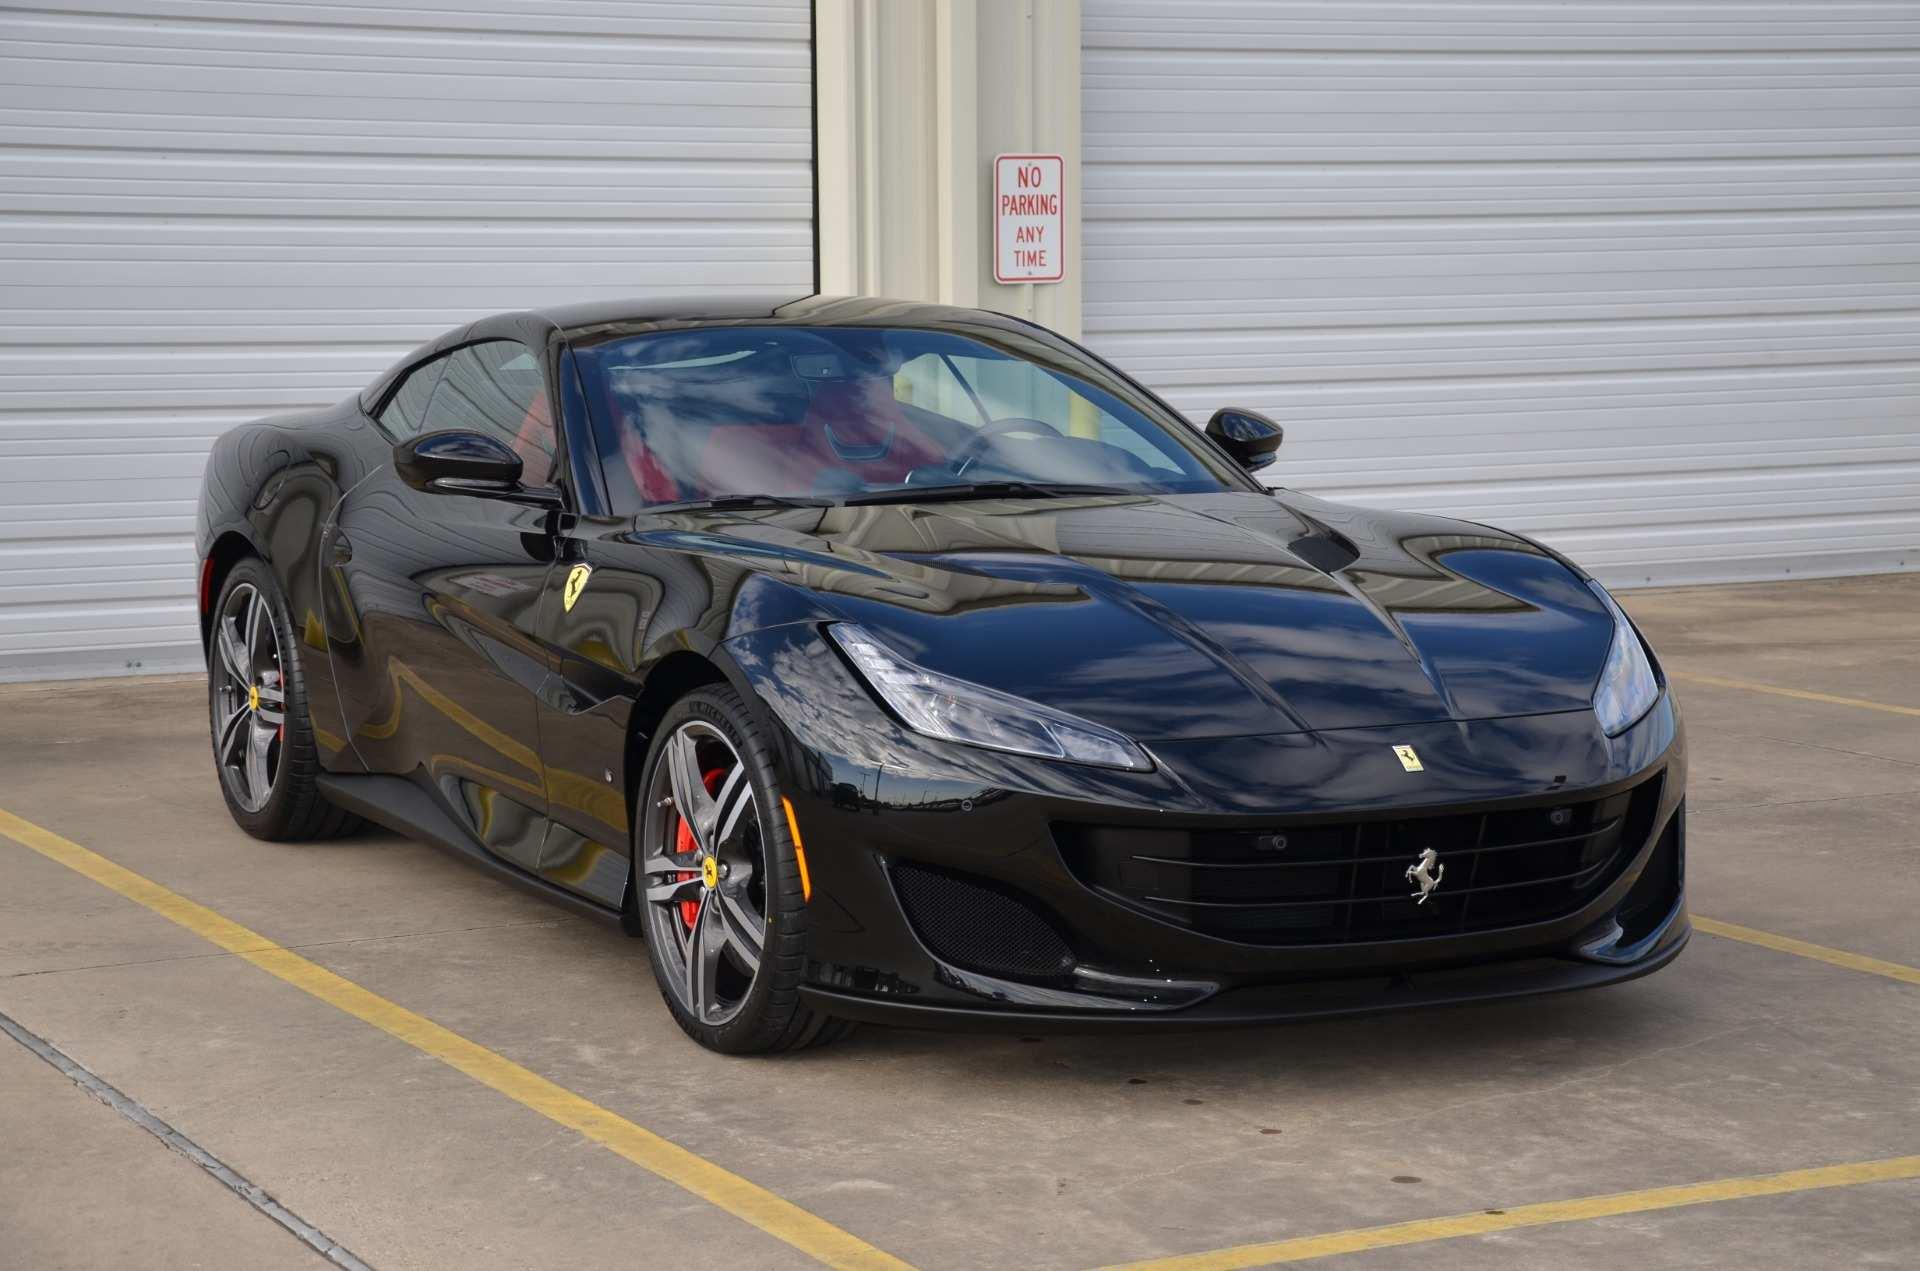 76 Concept of 2019 Ferrari For Sale Exterior by 2019 Ferrari For Sale